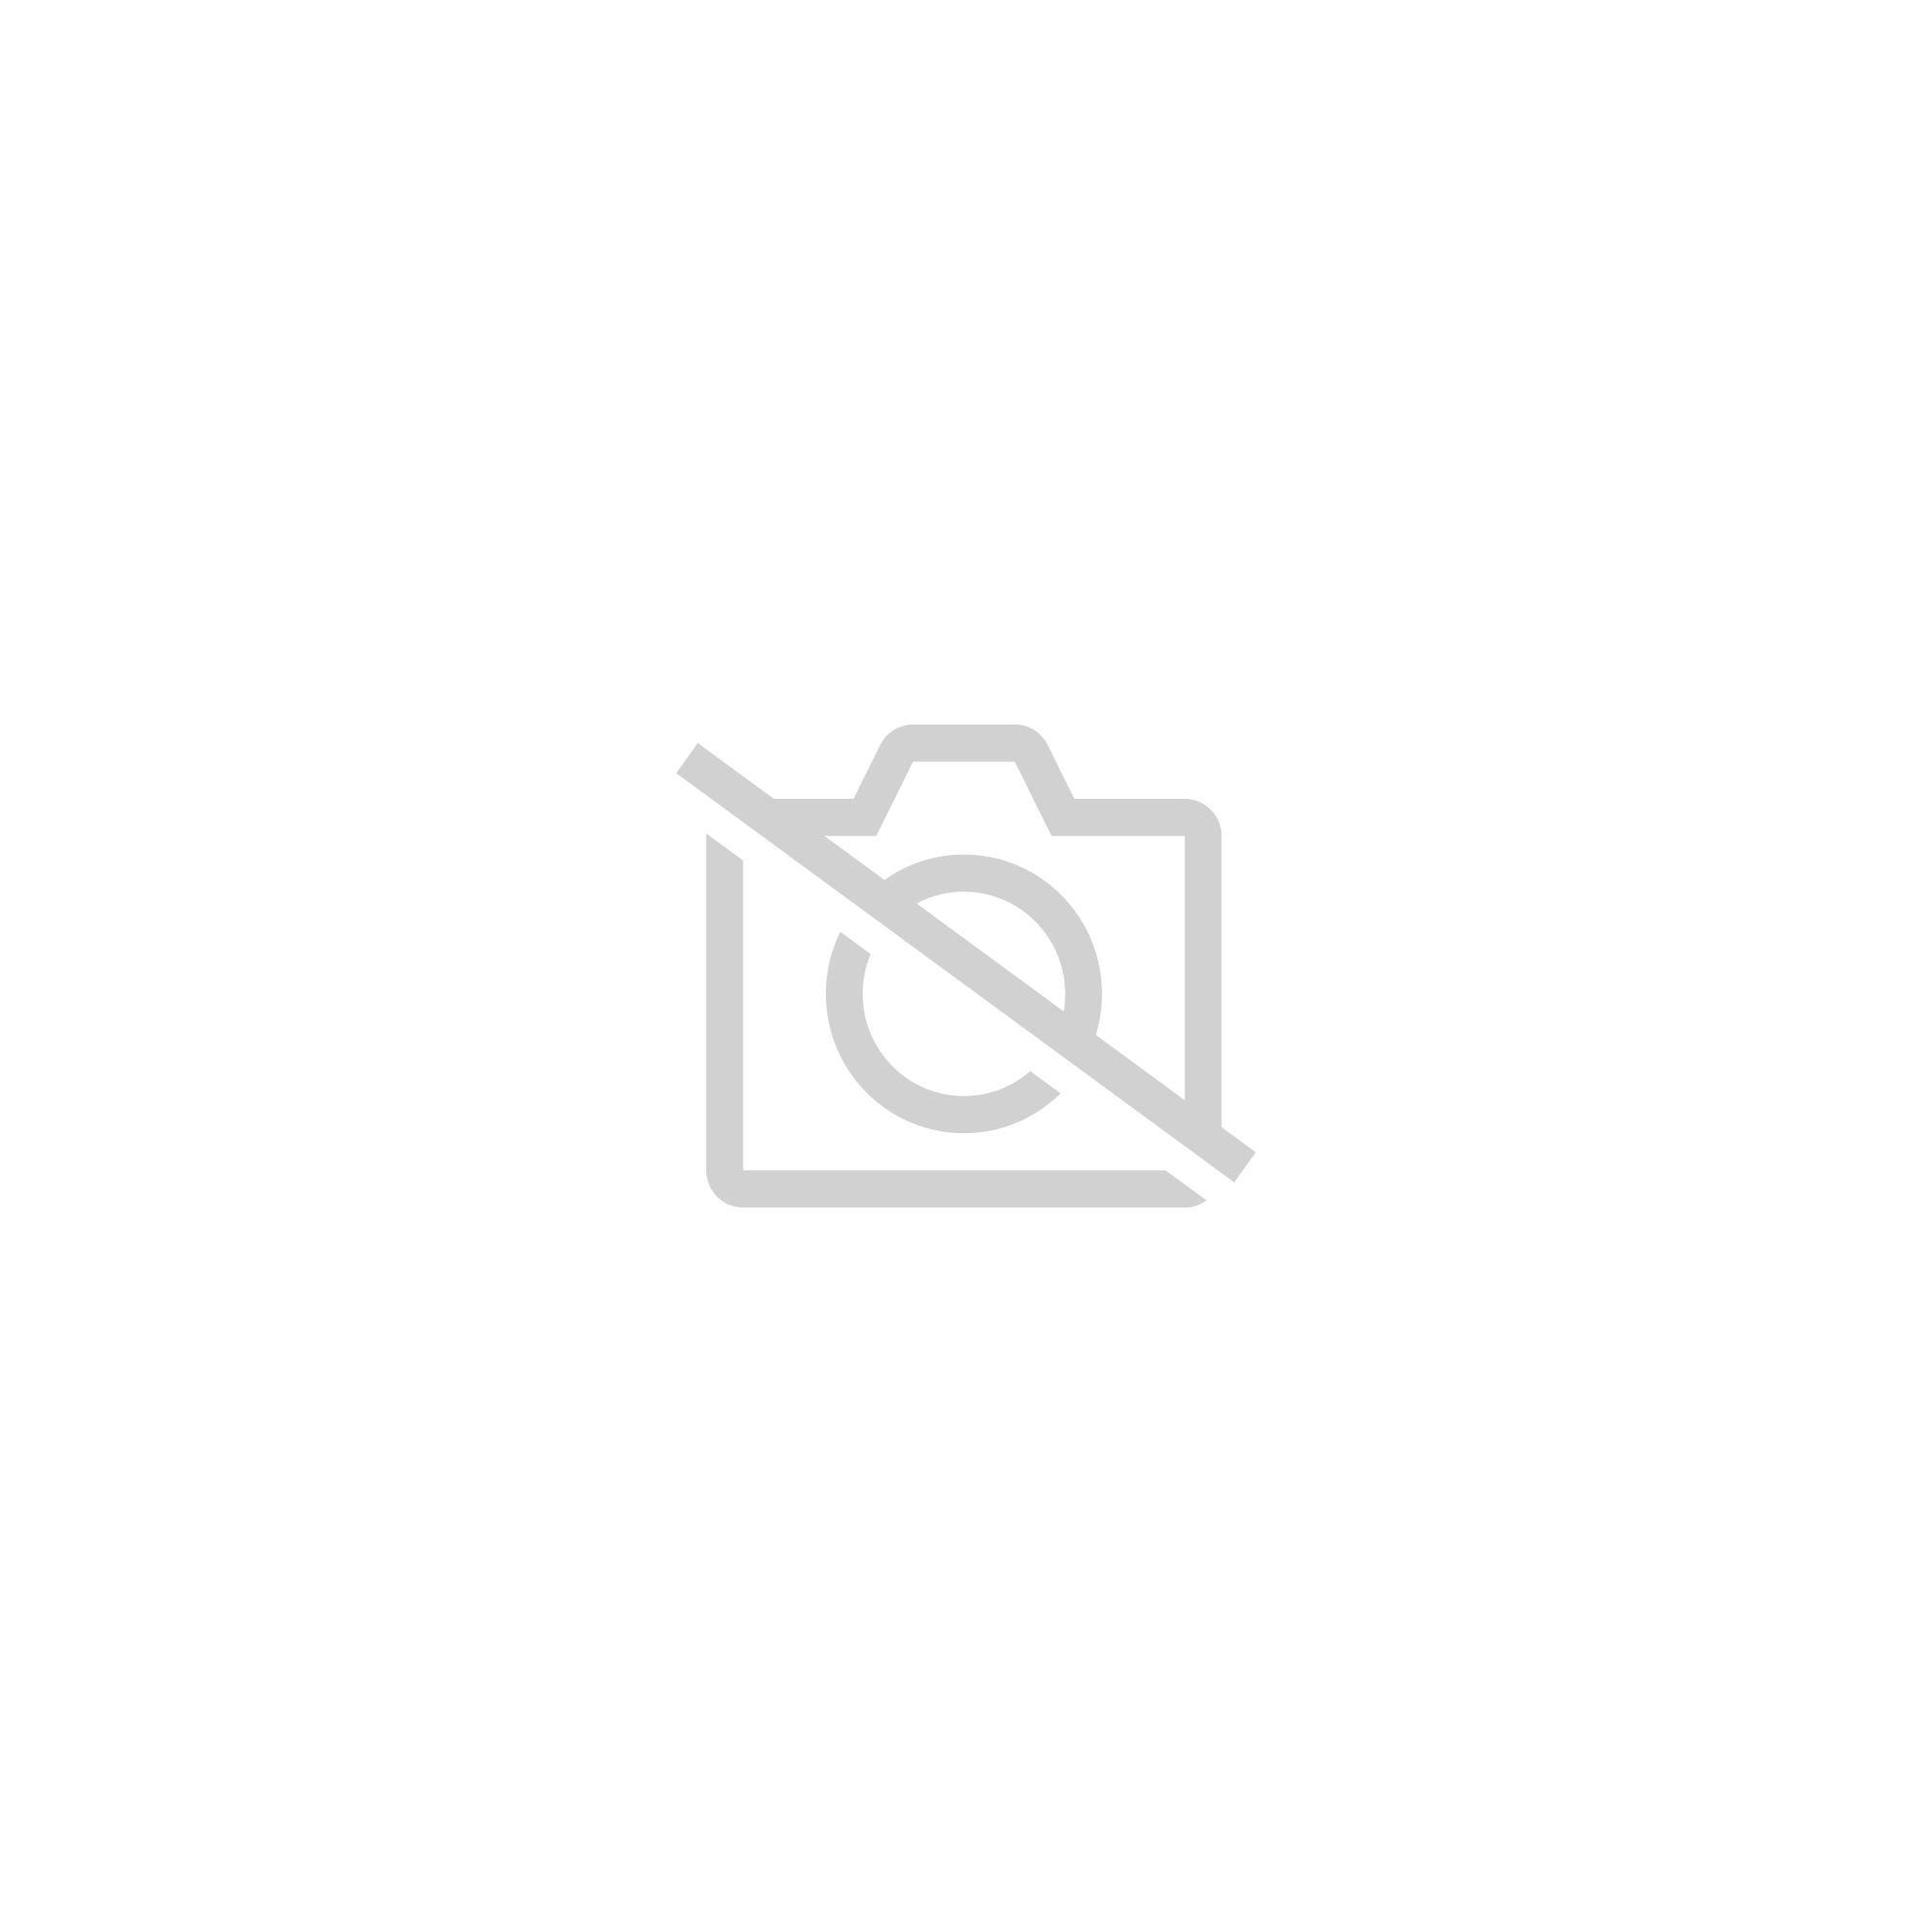 bache camion pas cher ou d 39 occasion sur priceminister rakuten. Black Bedroom Furniture Sets. Home Design Ideas